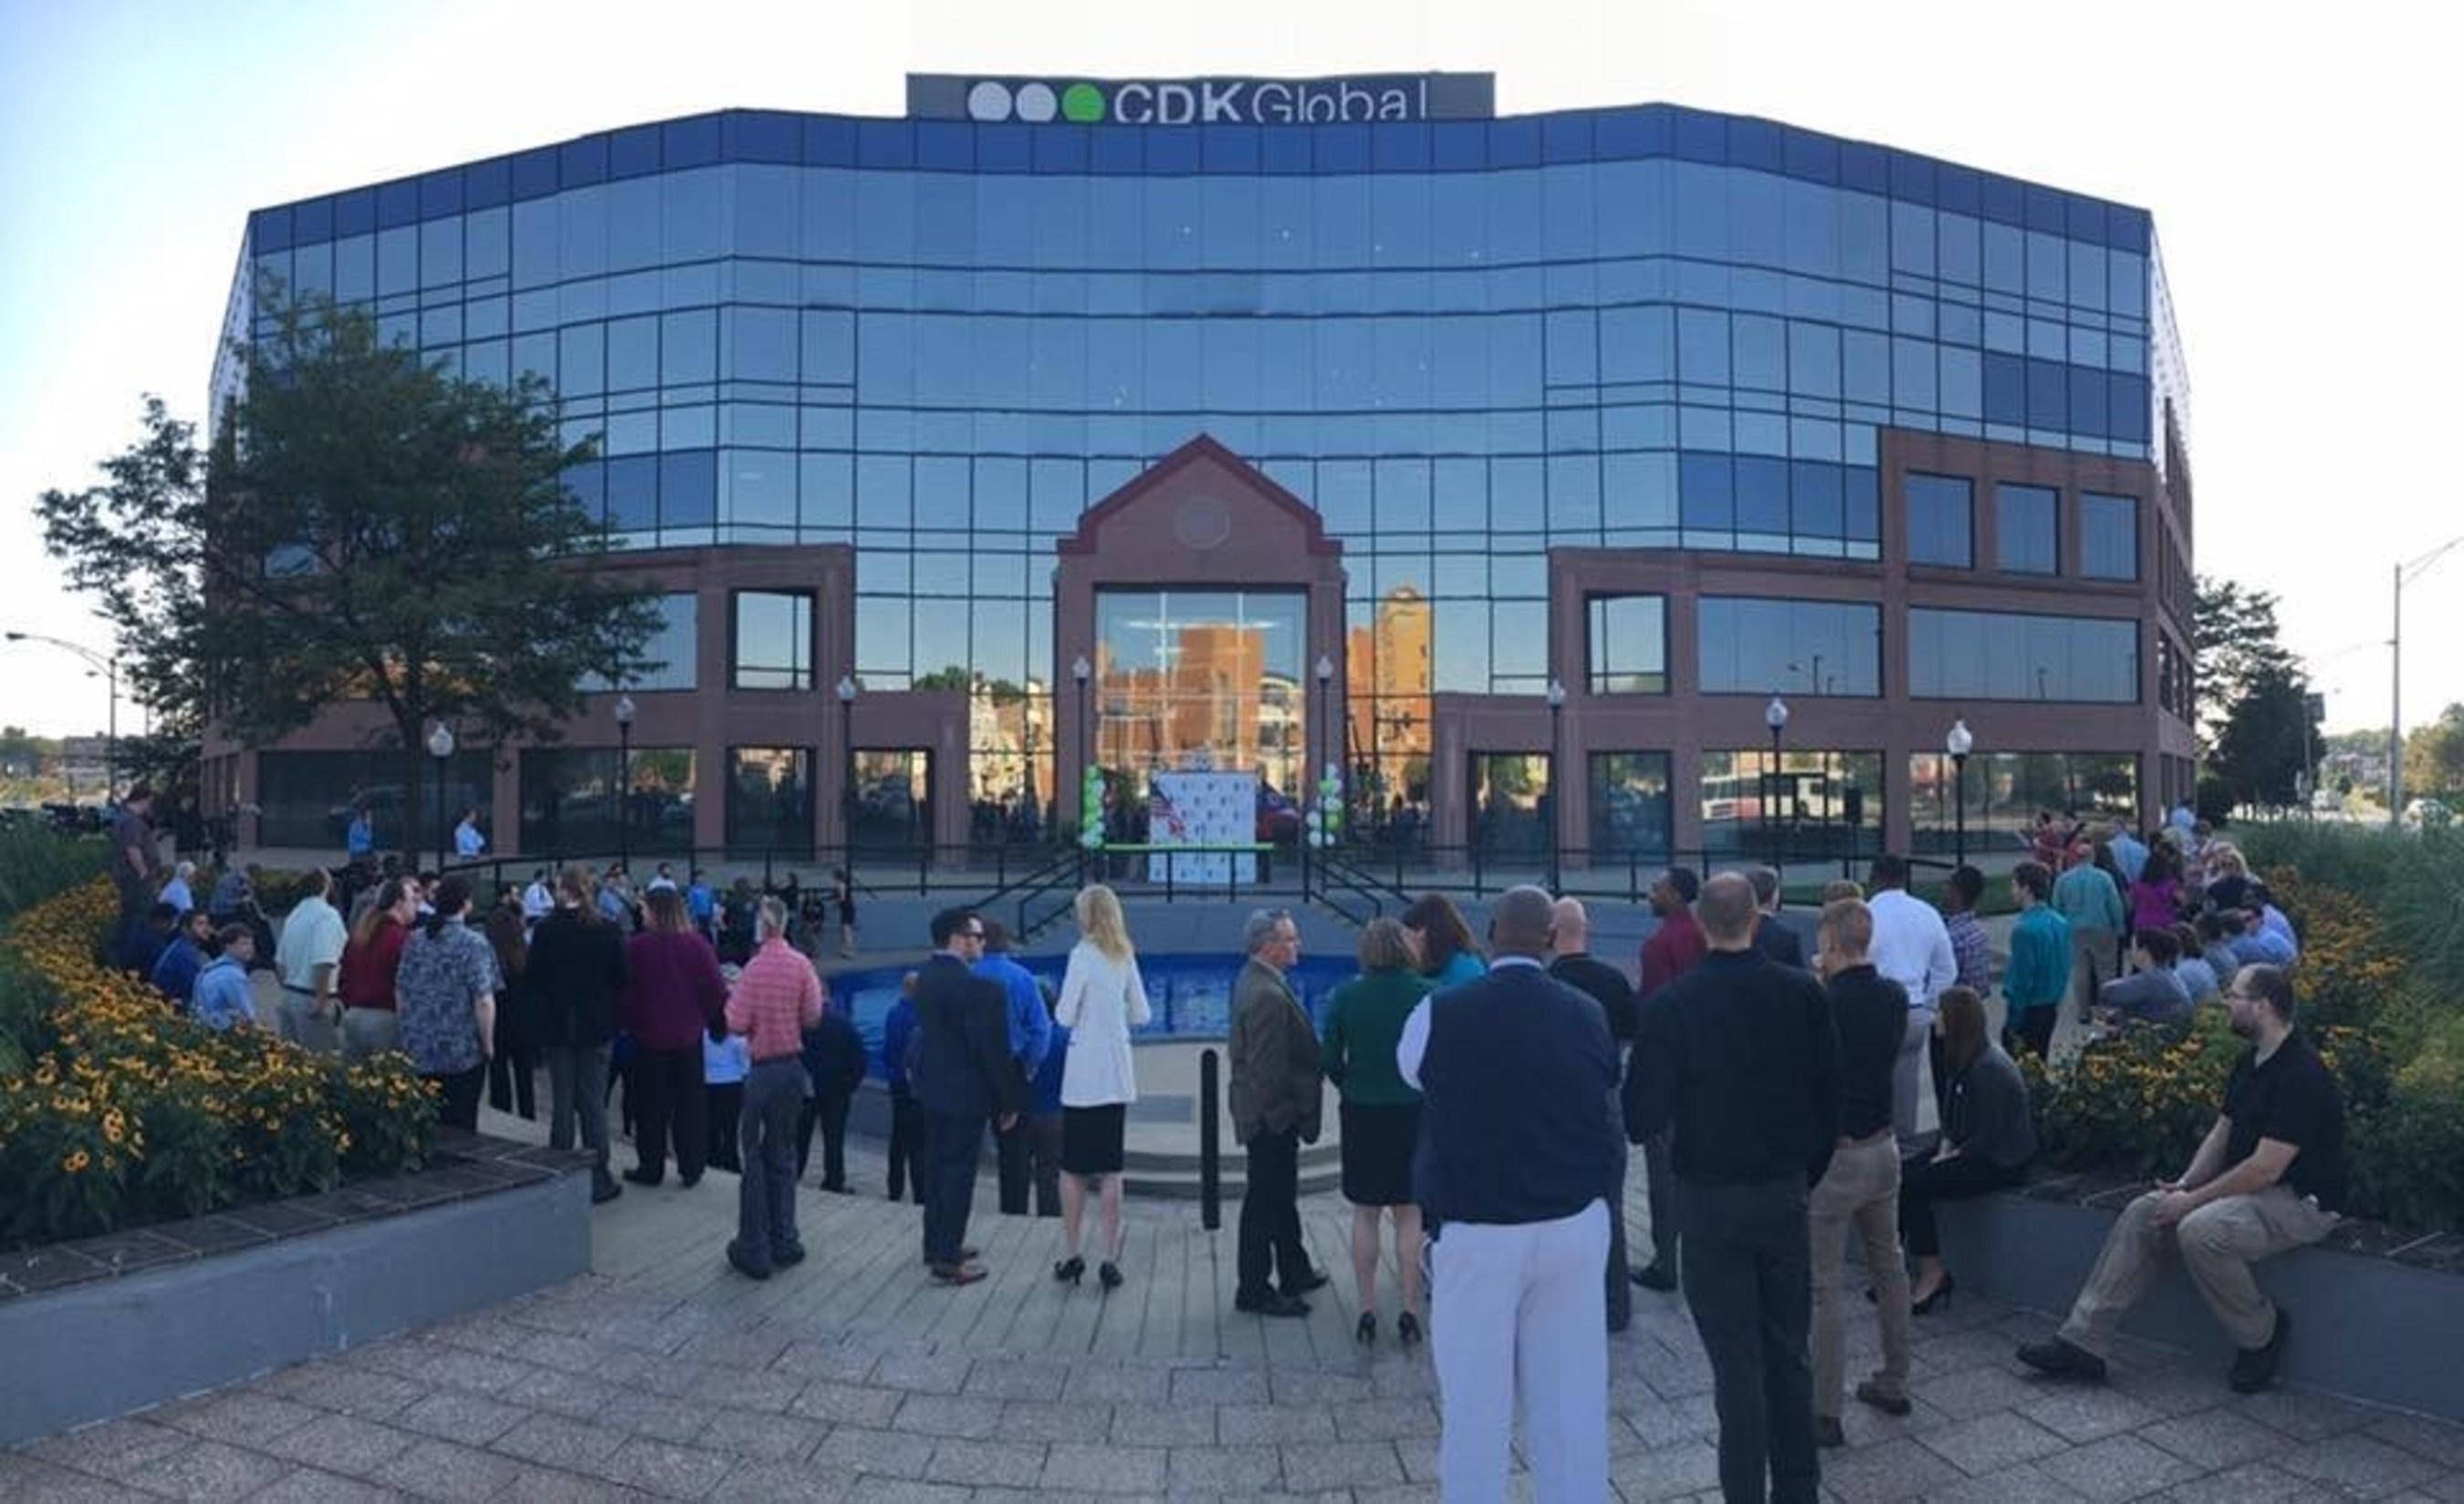 Exterior of the new CDK Global Customer Experience Center in Cincinnati, Ohio